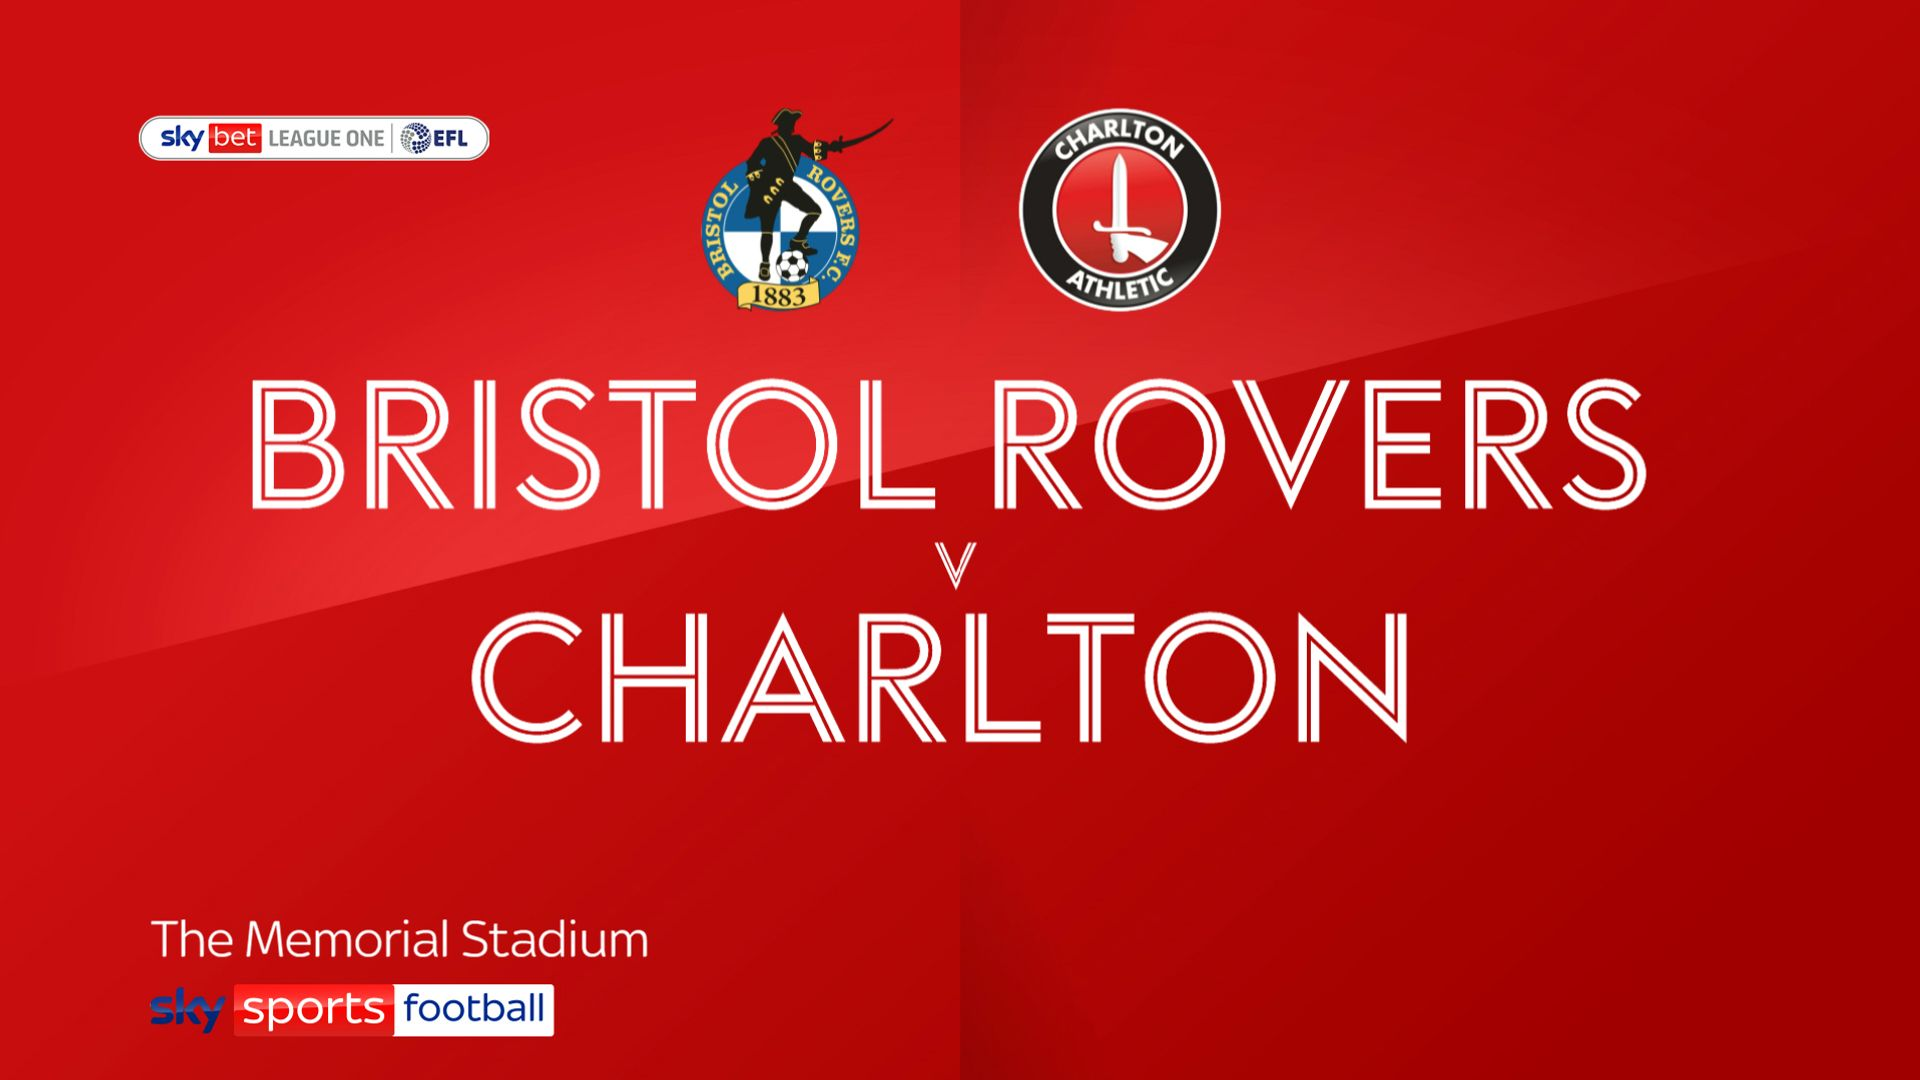 Bristol Rovers sunk by 10-man Charlton